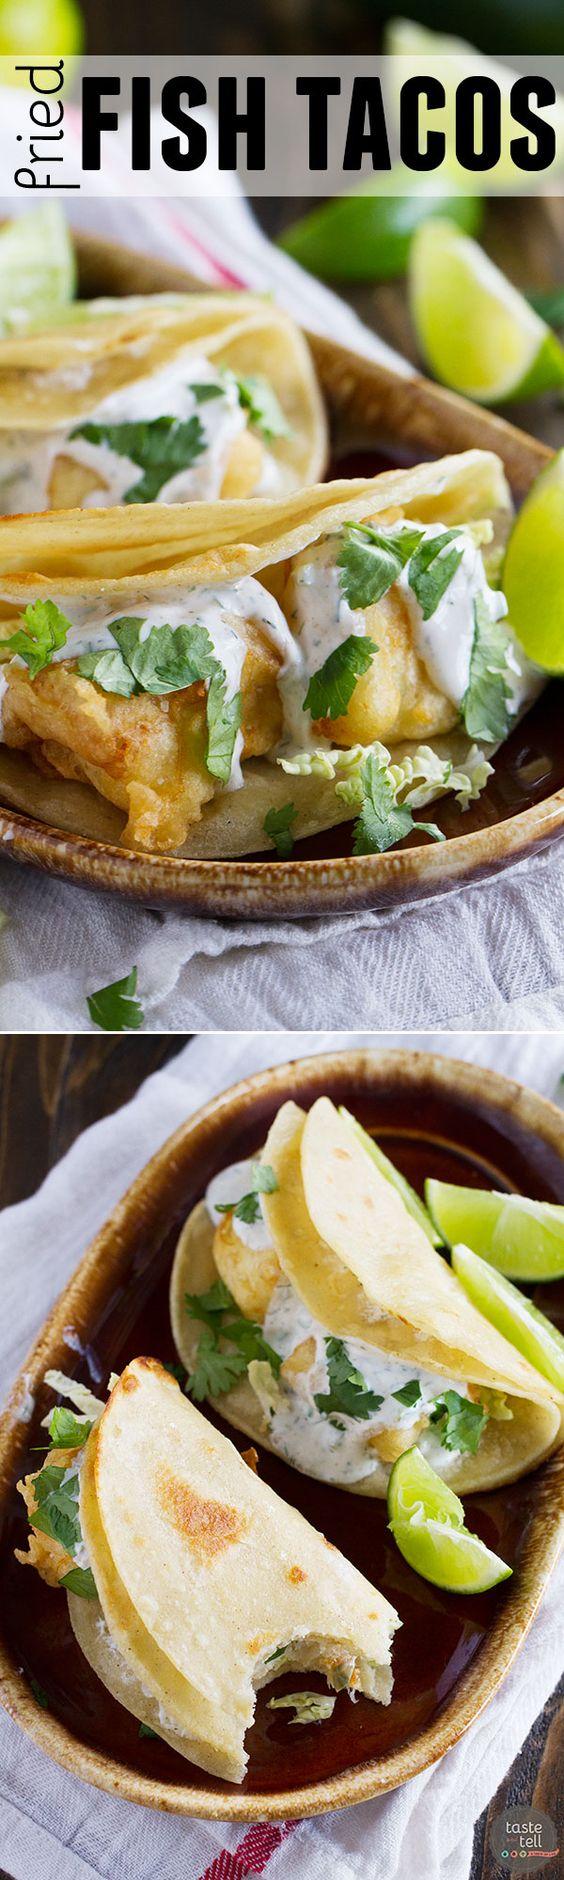 Pinterest the world s catalog of ideas for Fish taco batter recipe